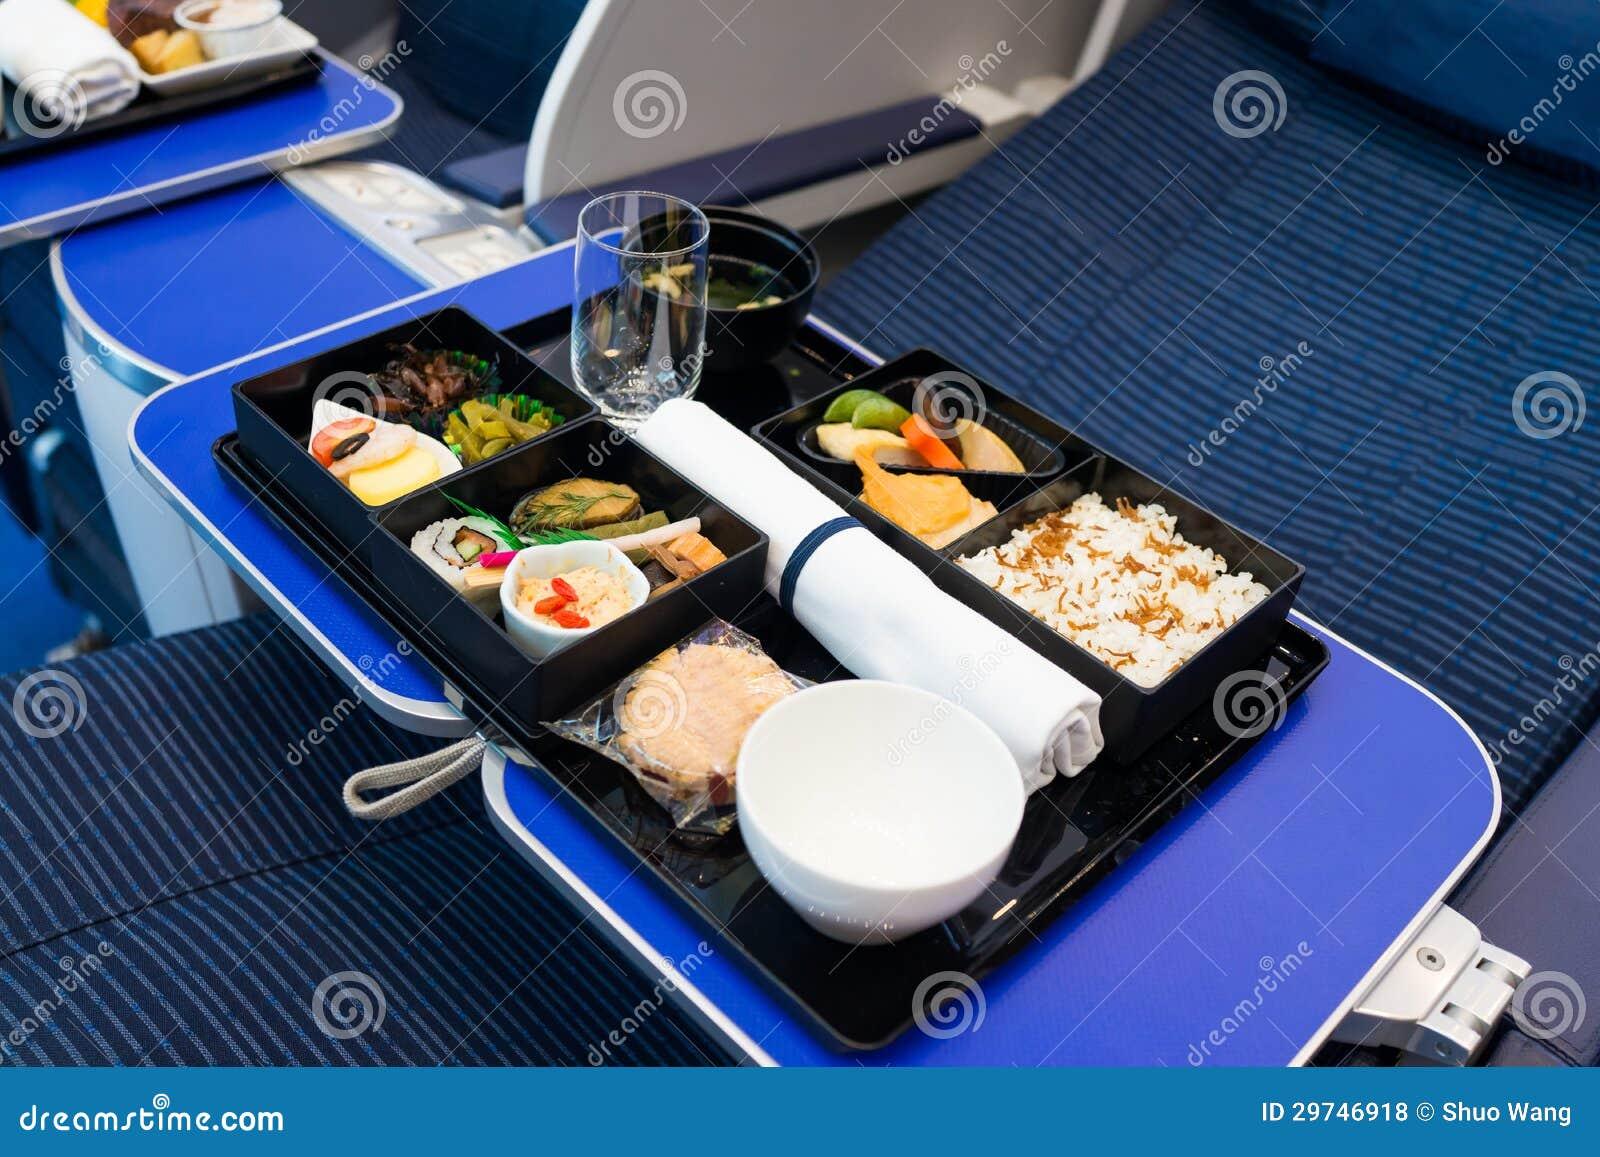 In-flight catering